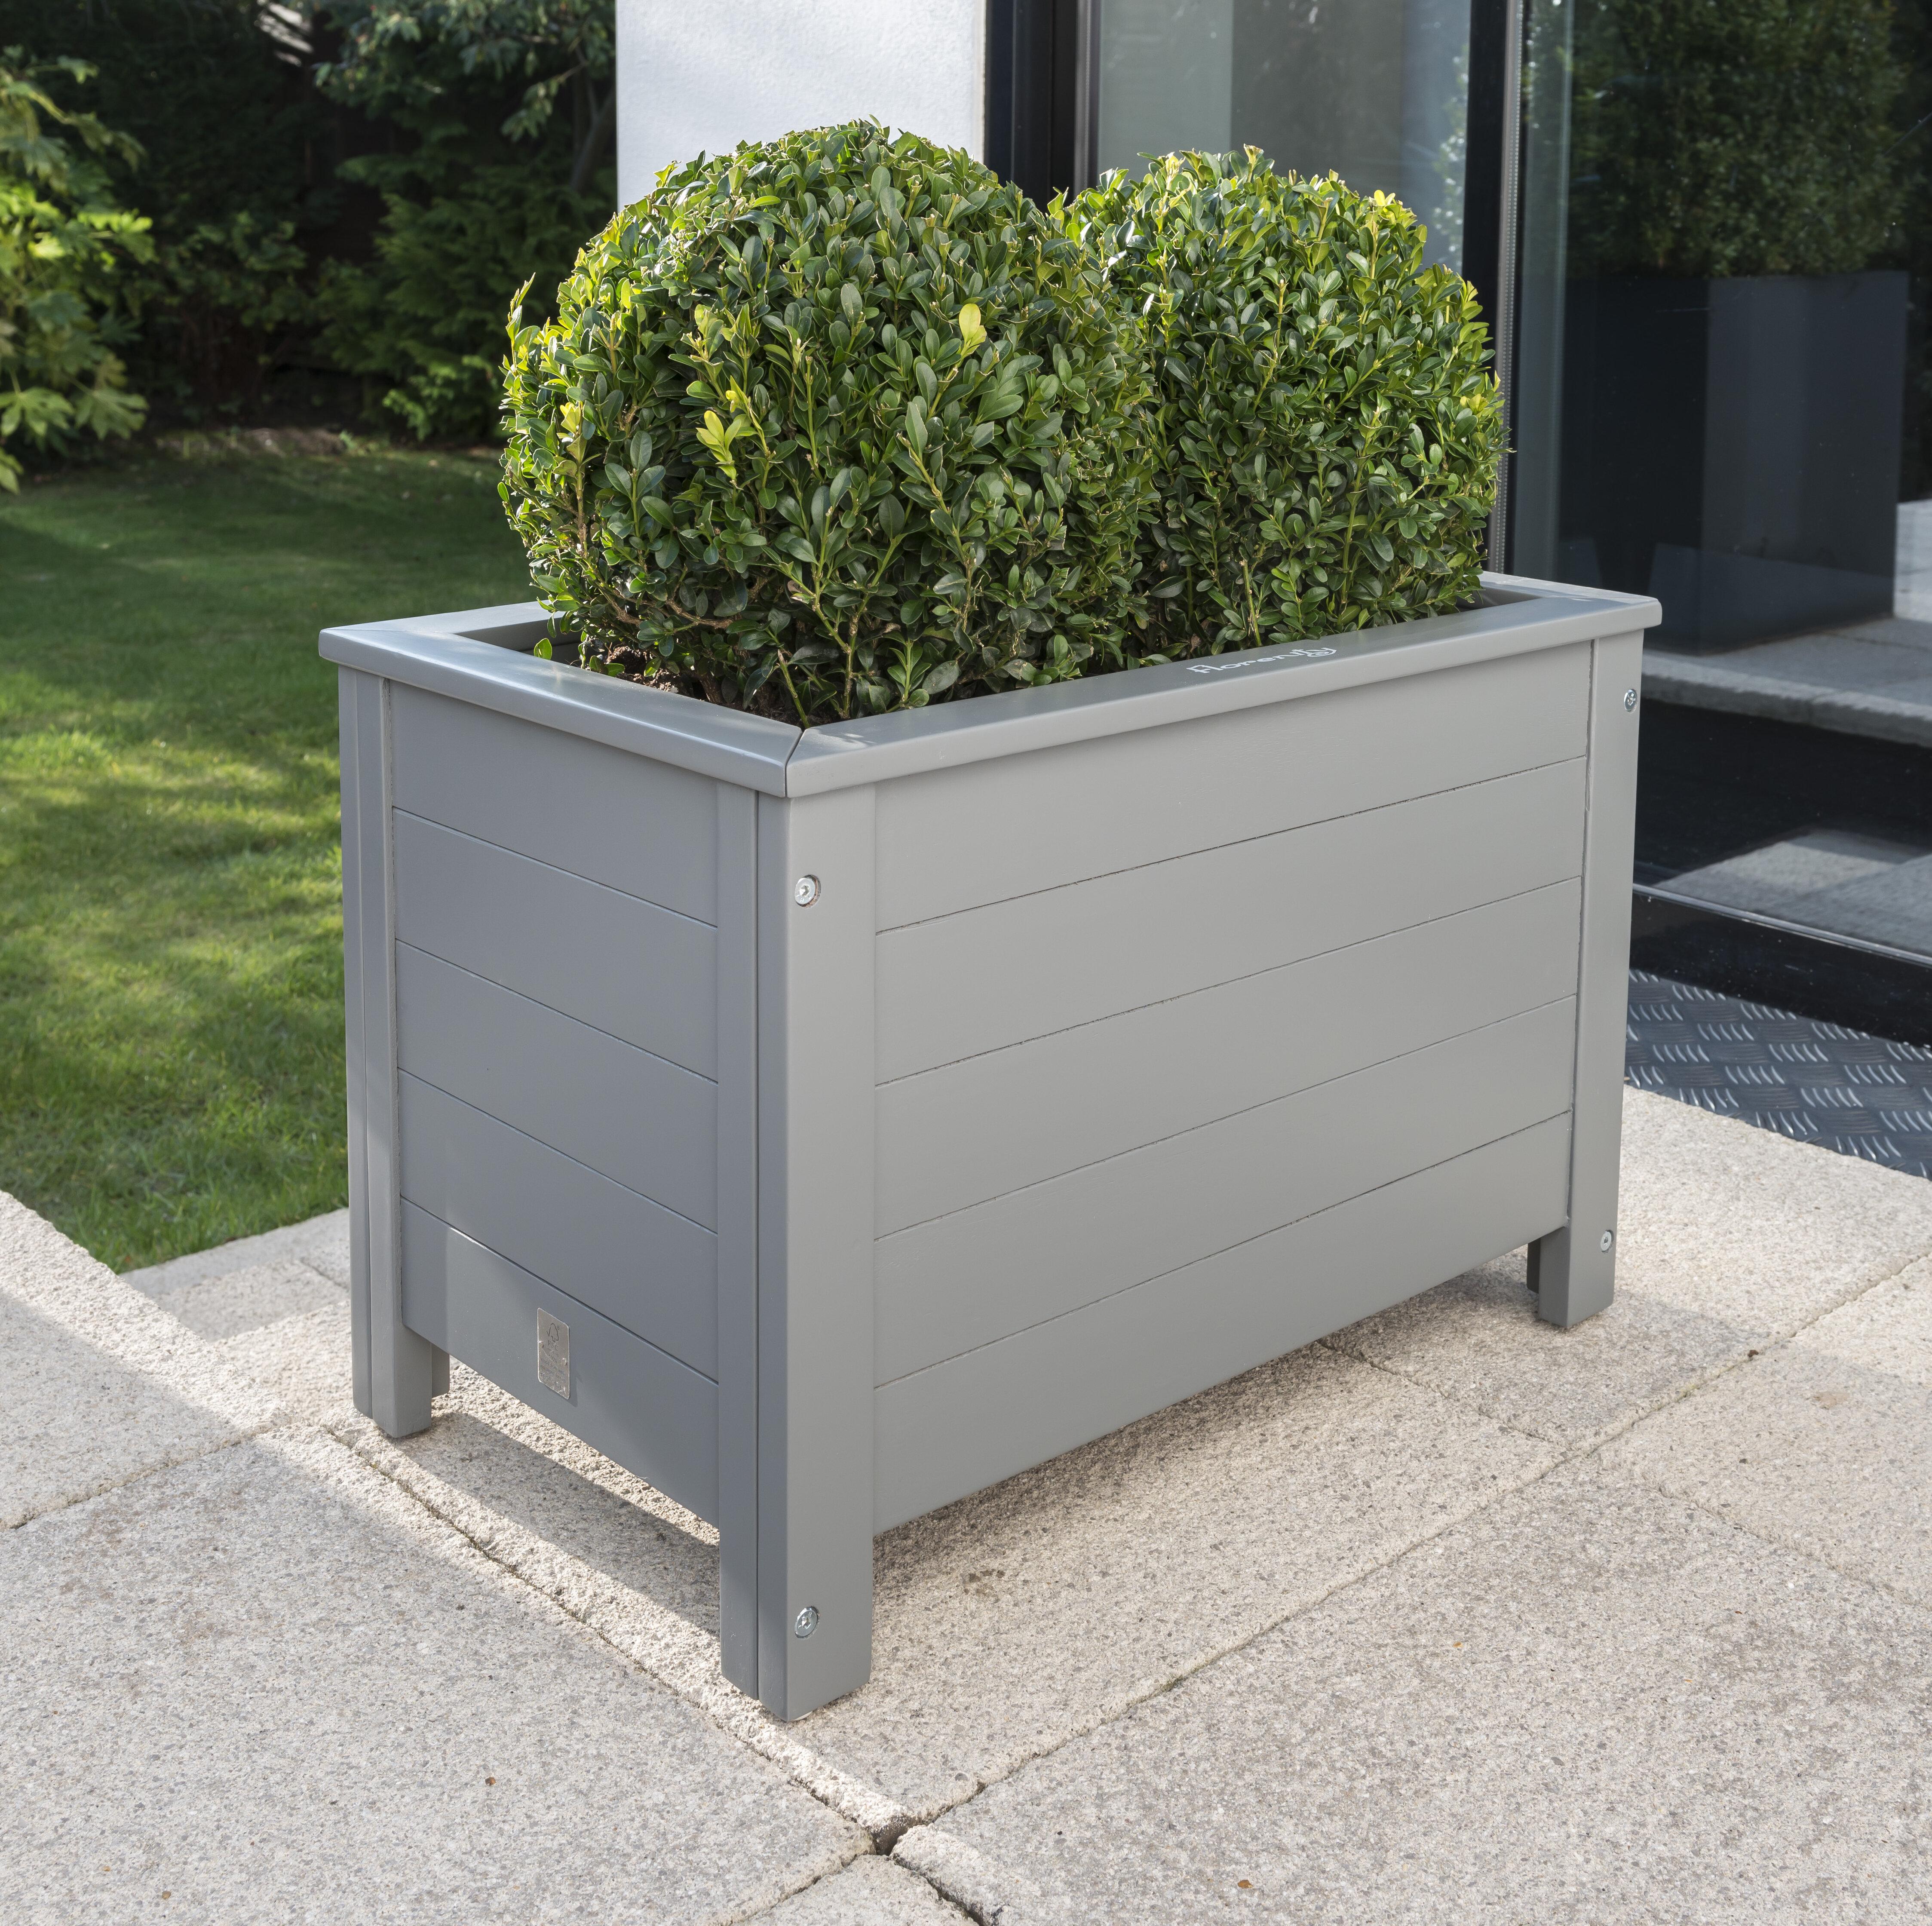 Sol 72 Outdoor Osier Wooden Planter Box